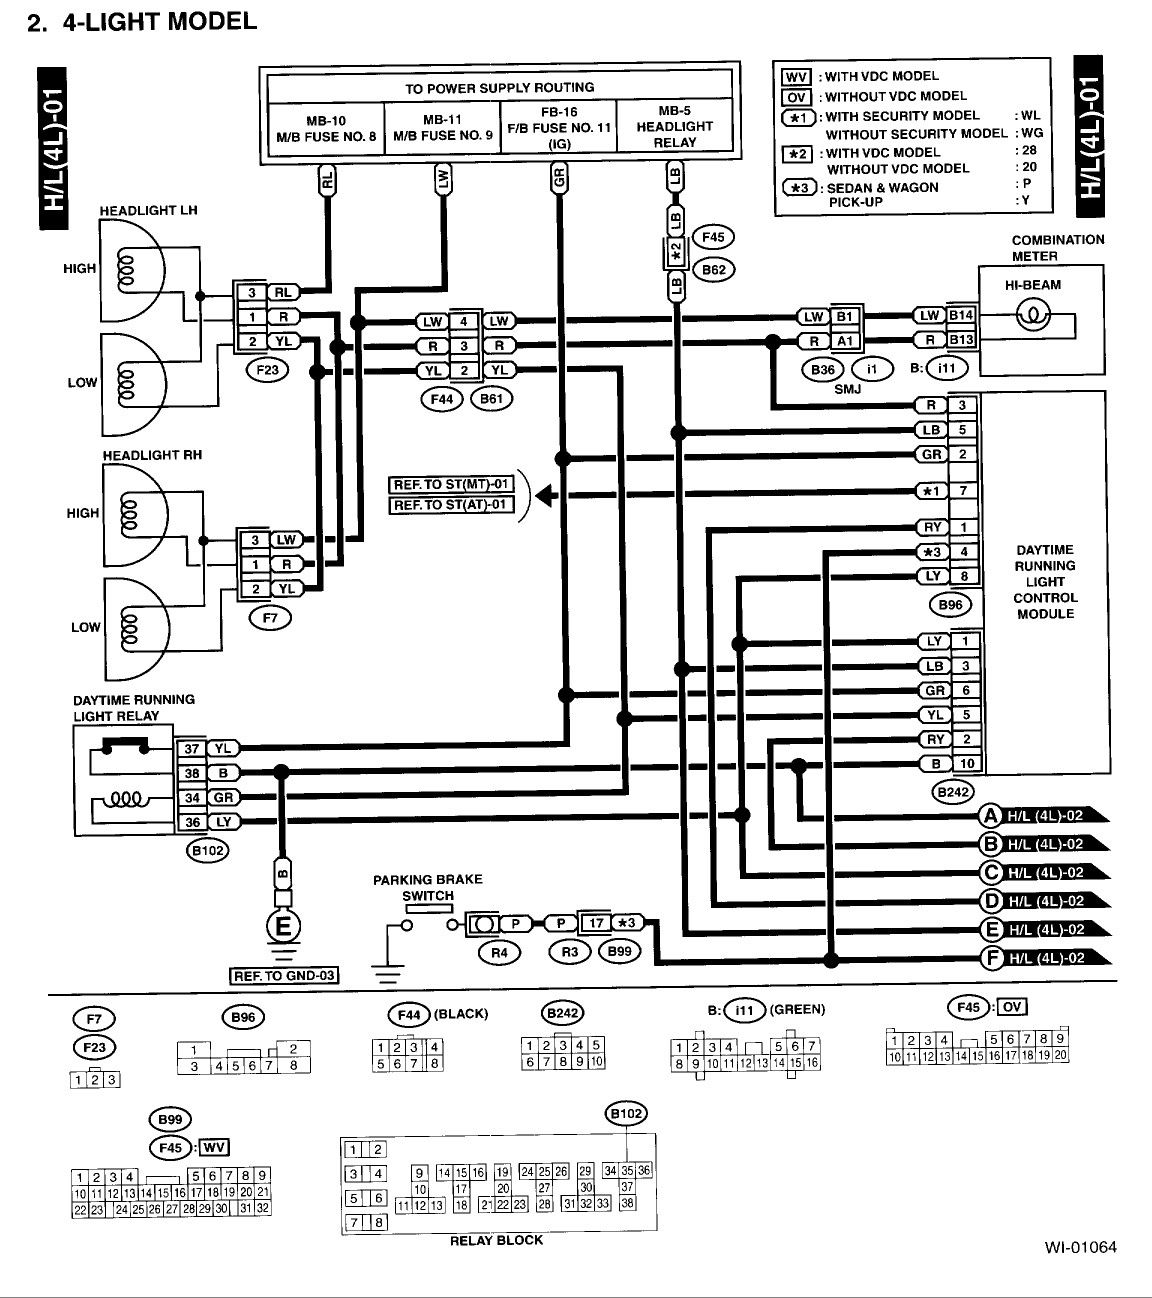 Subaru Mcintosh Wiring Diagram Collection Subaru Legacy Subaru Subaru Wrx Engine